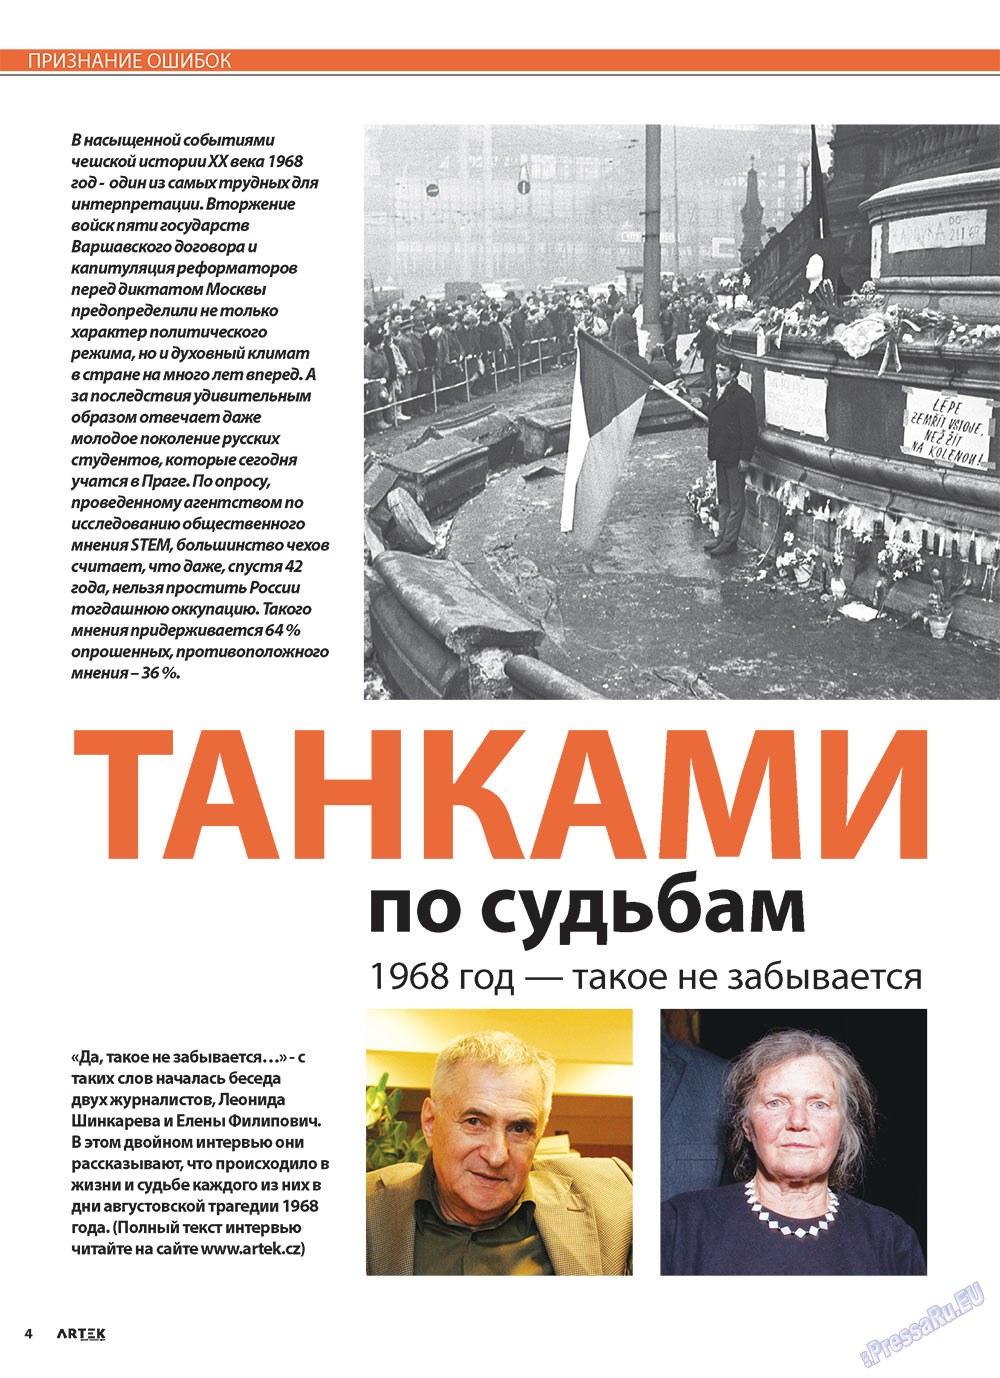 Артек (журнал). 2010 год, номер 4, стр. 6